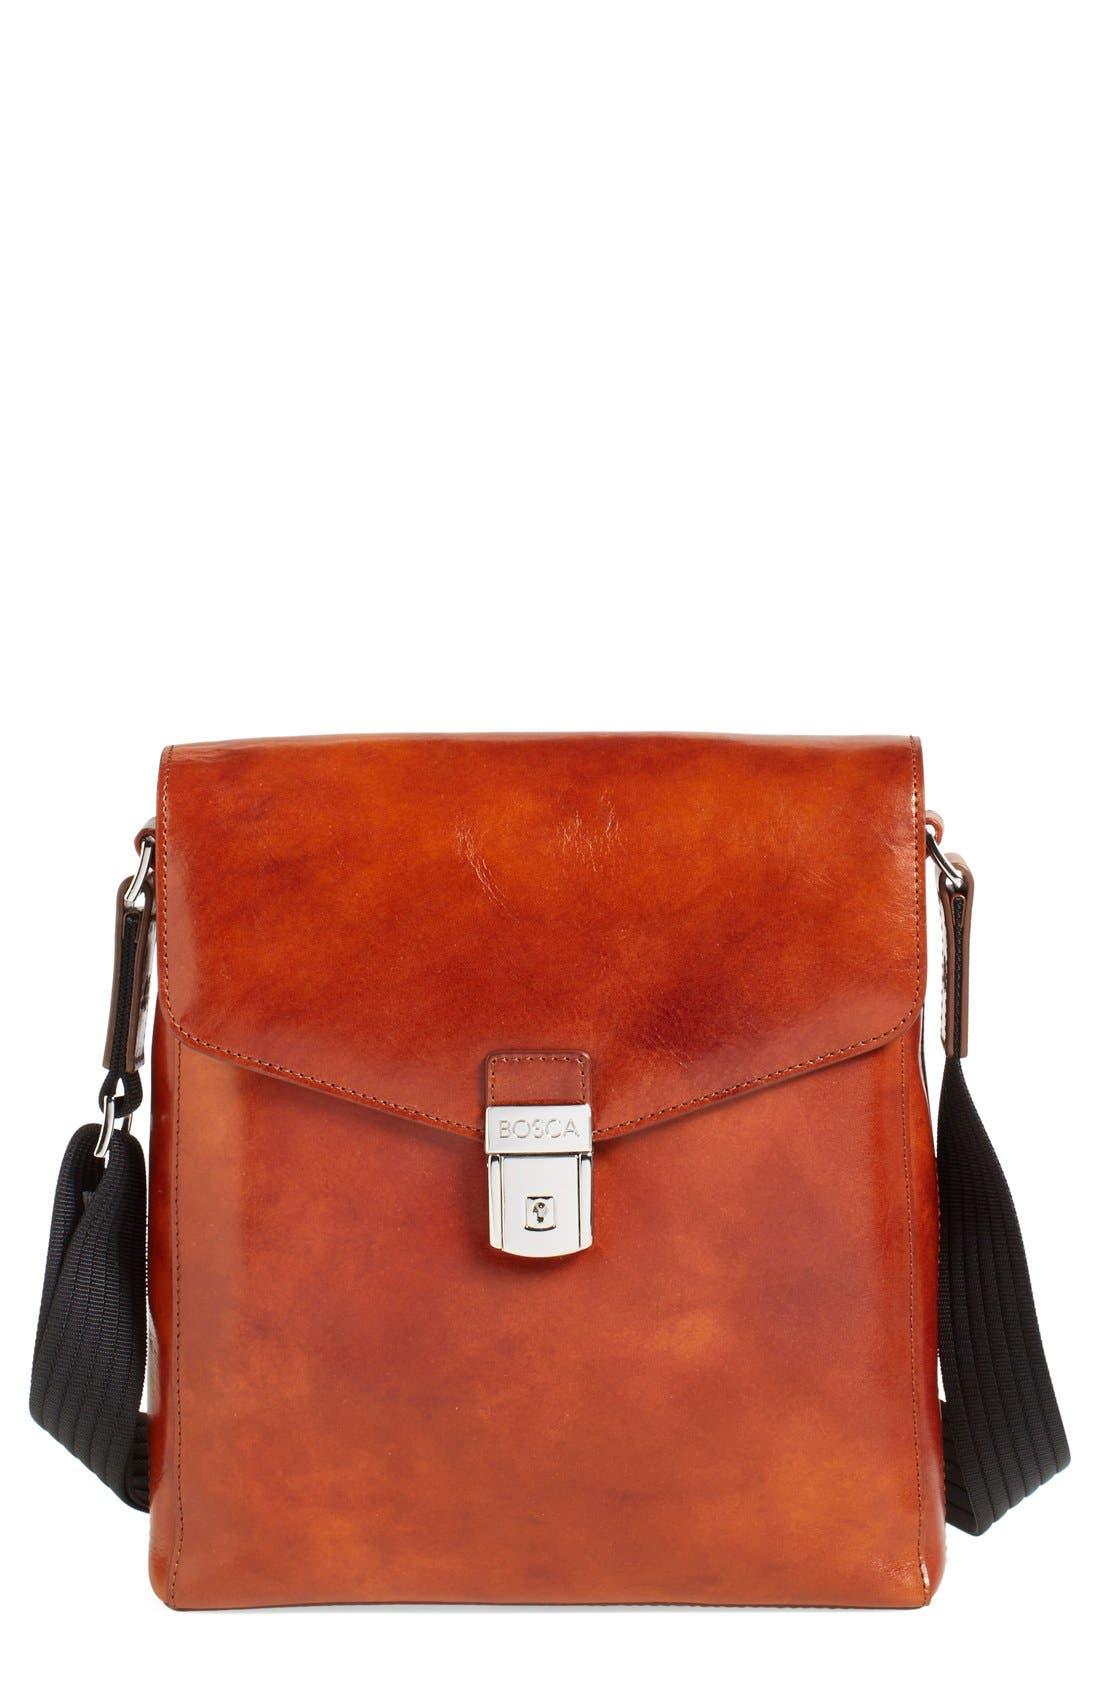 'Man Bag' Leather Crossbody Bag,                         Main,                         color, 233